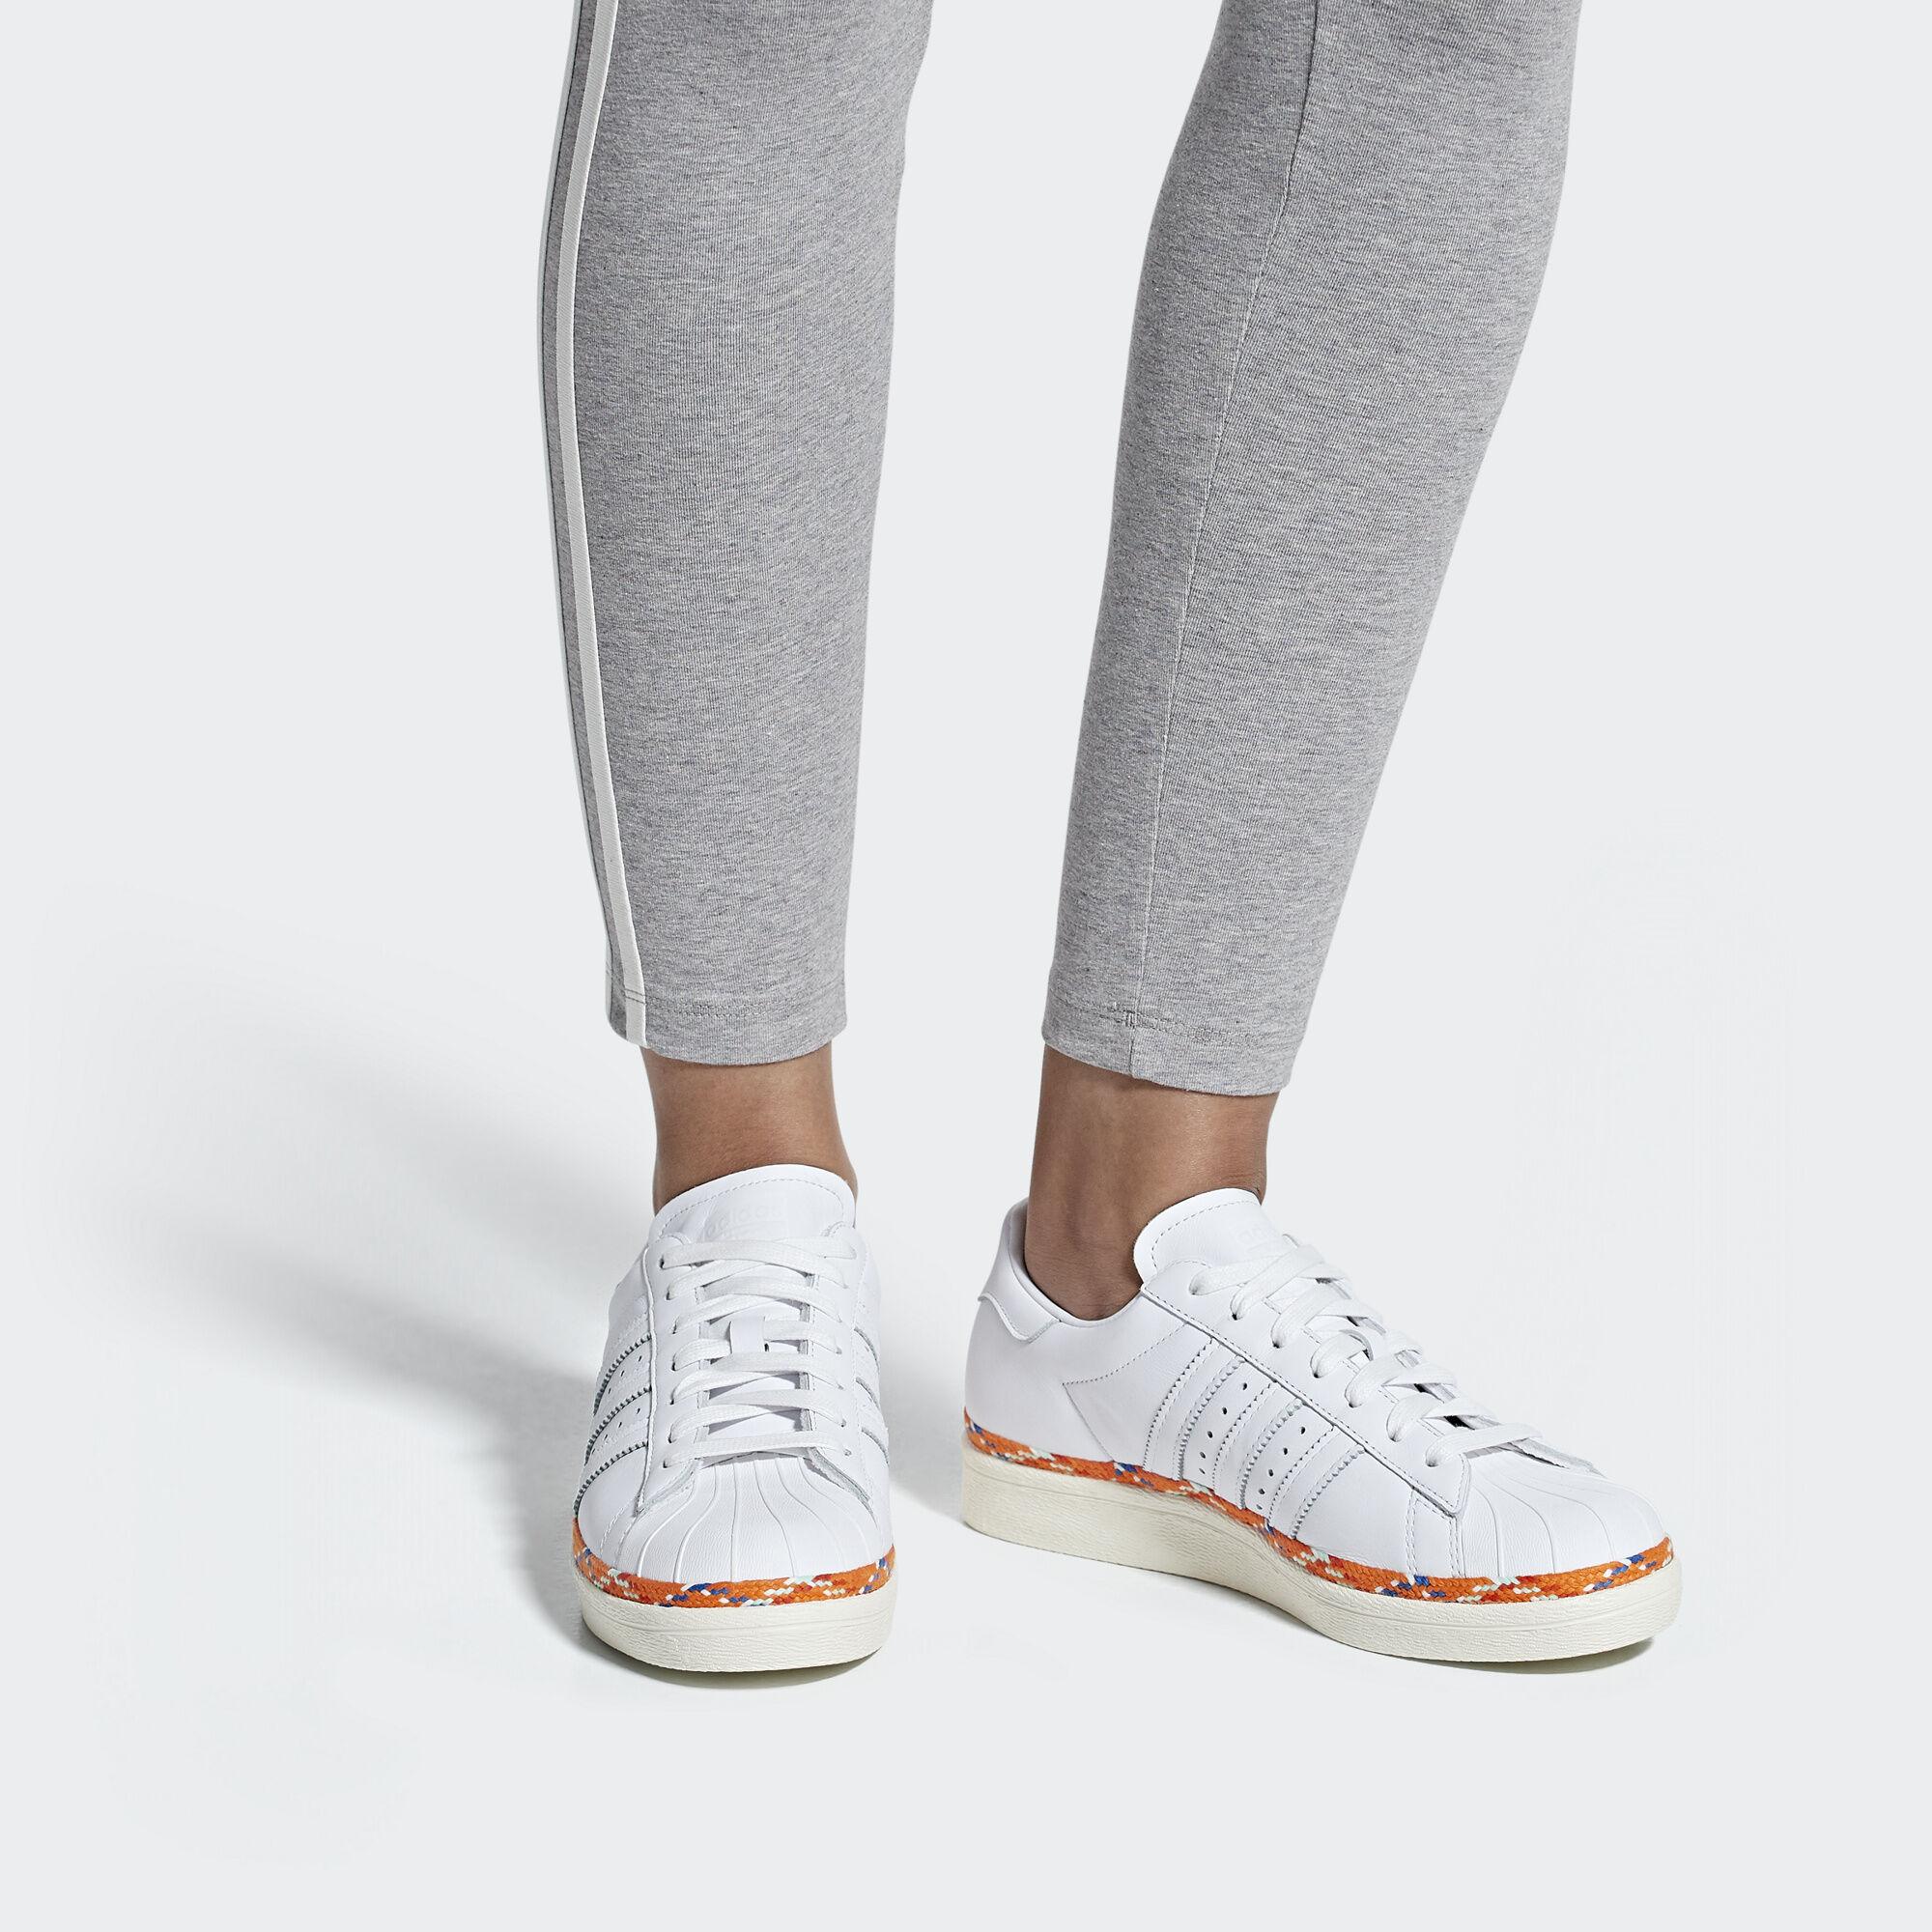 adidas Sapatos Superstar 80s New Bold - Branco  9b2b50a8ba0e9